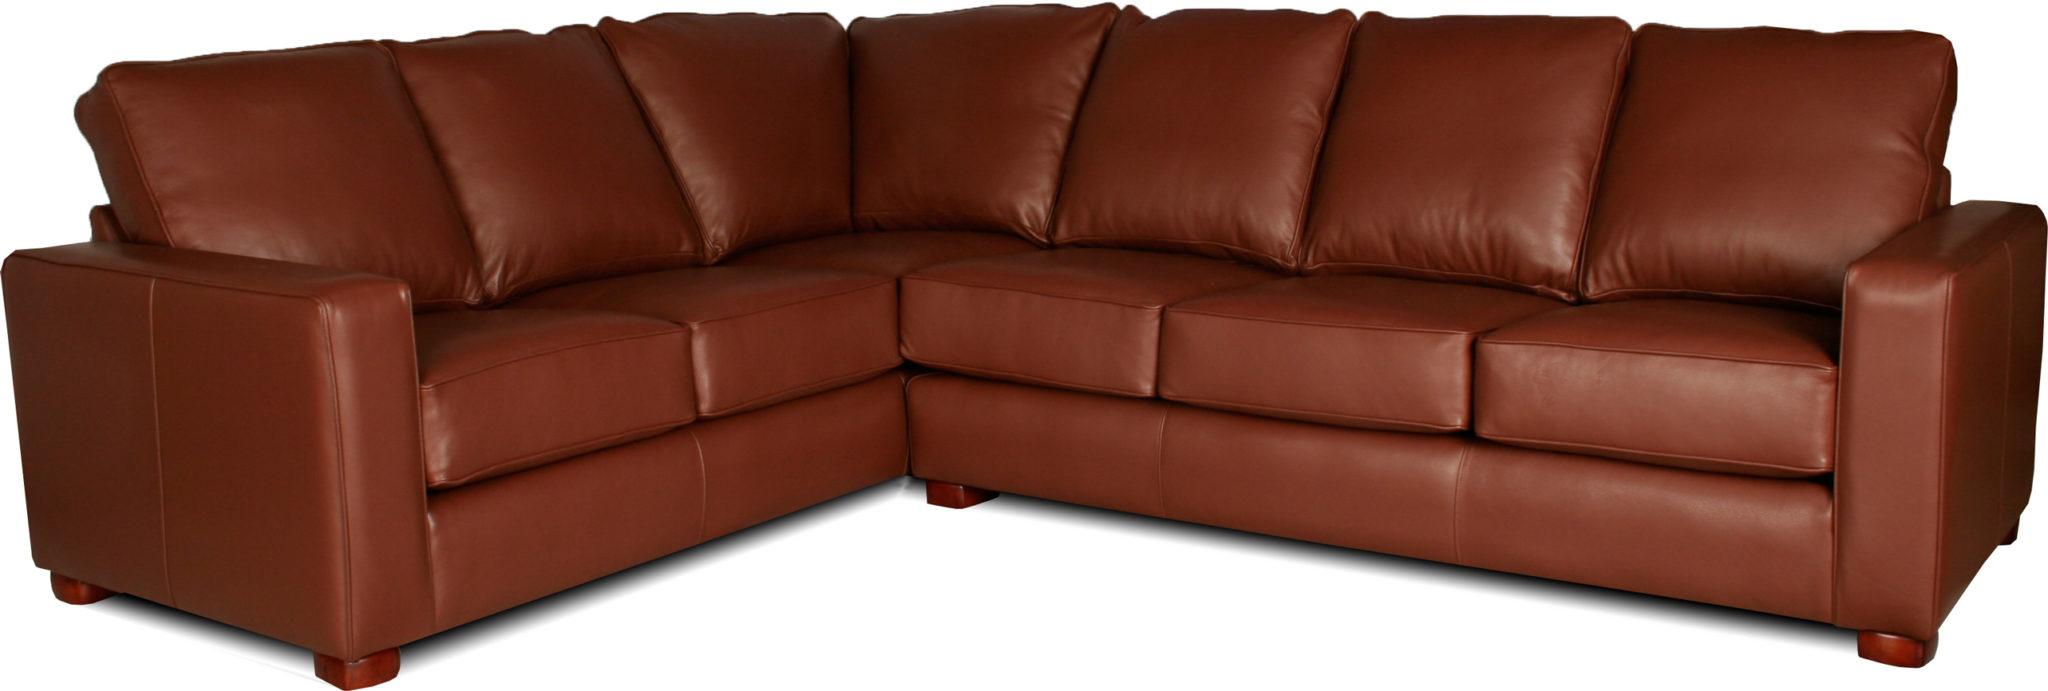 Lorenz - Leather Furniture | Leather Creations Furniture - Custom ...